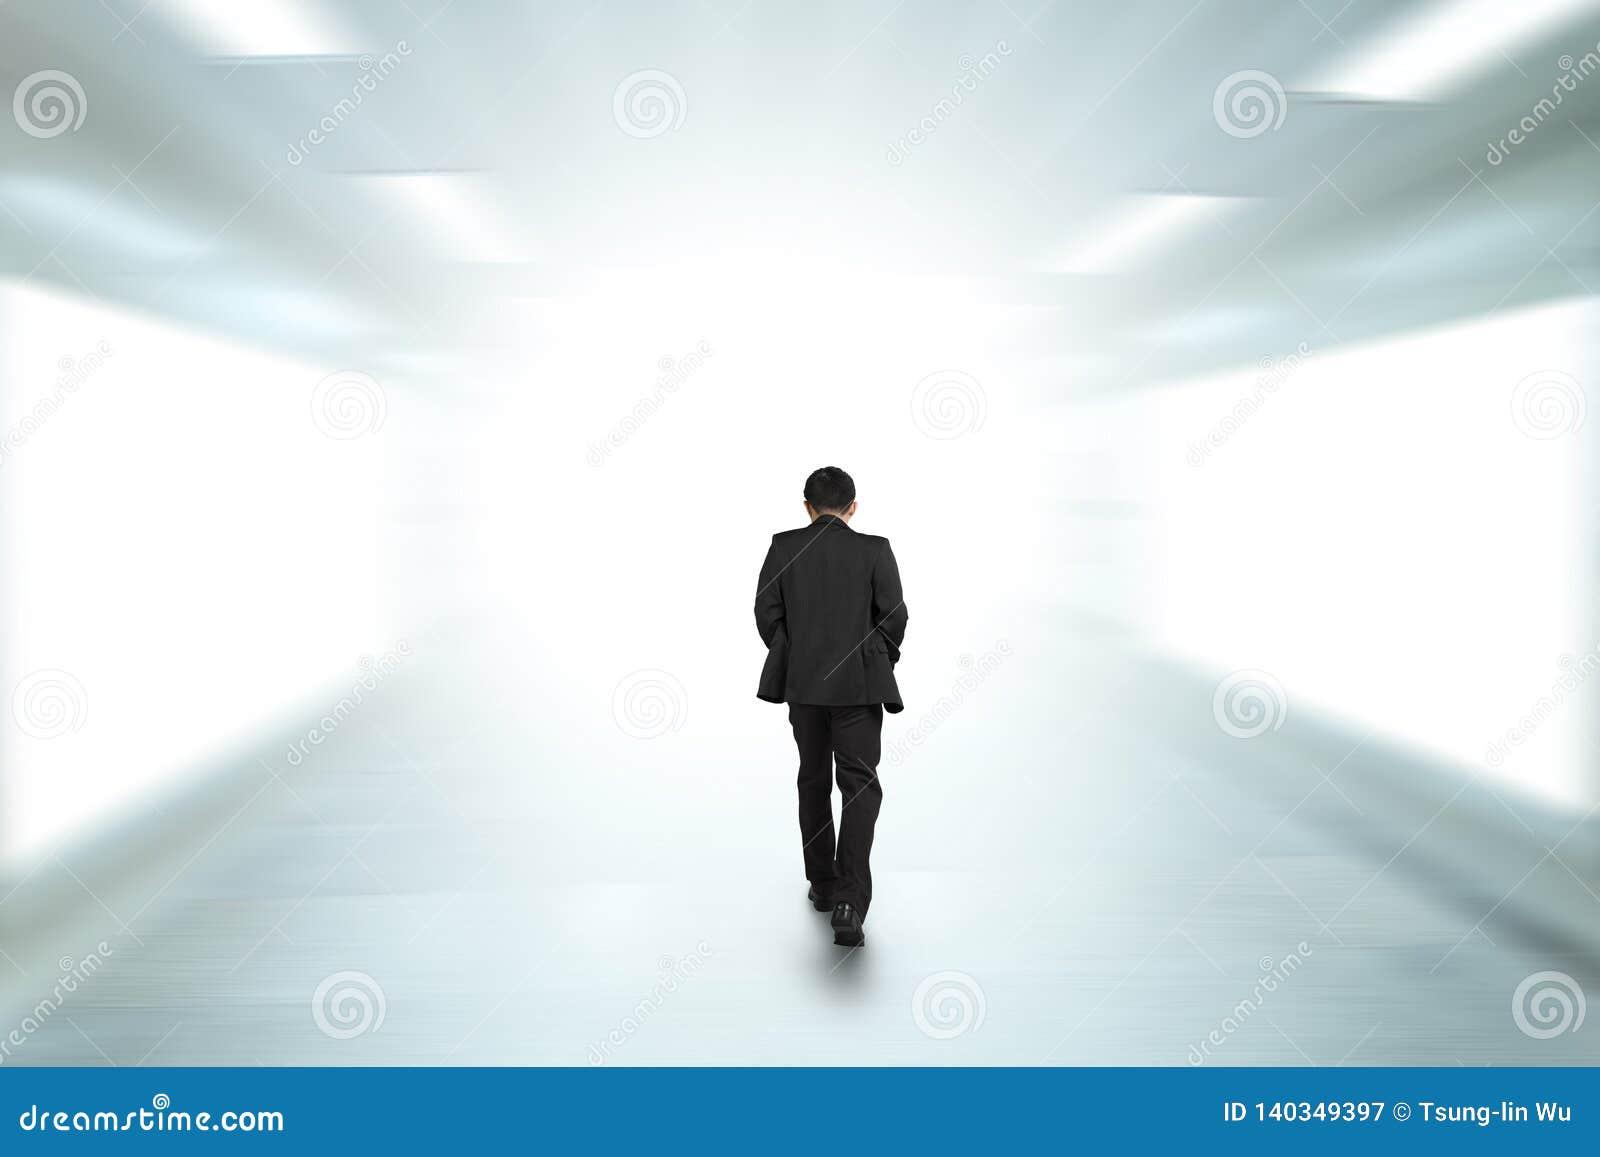 Rear view businessman walking through underpass toward bright side